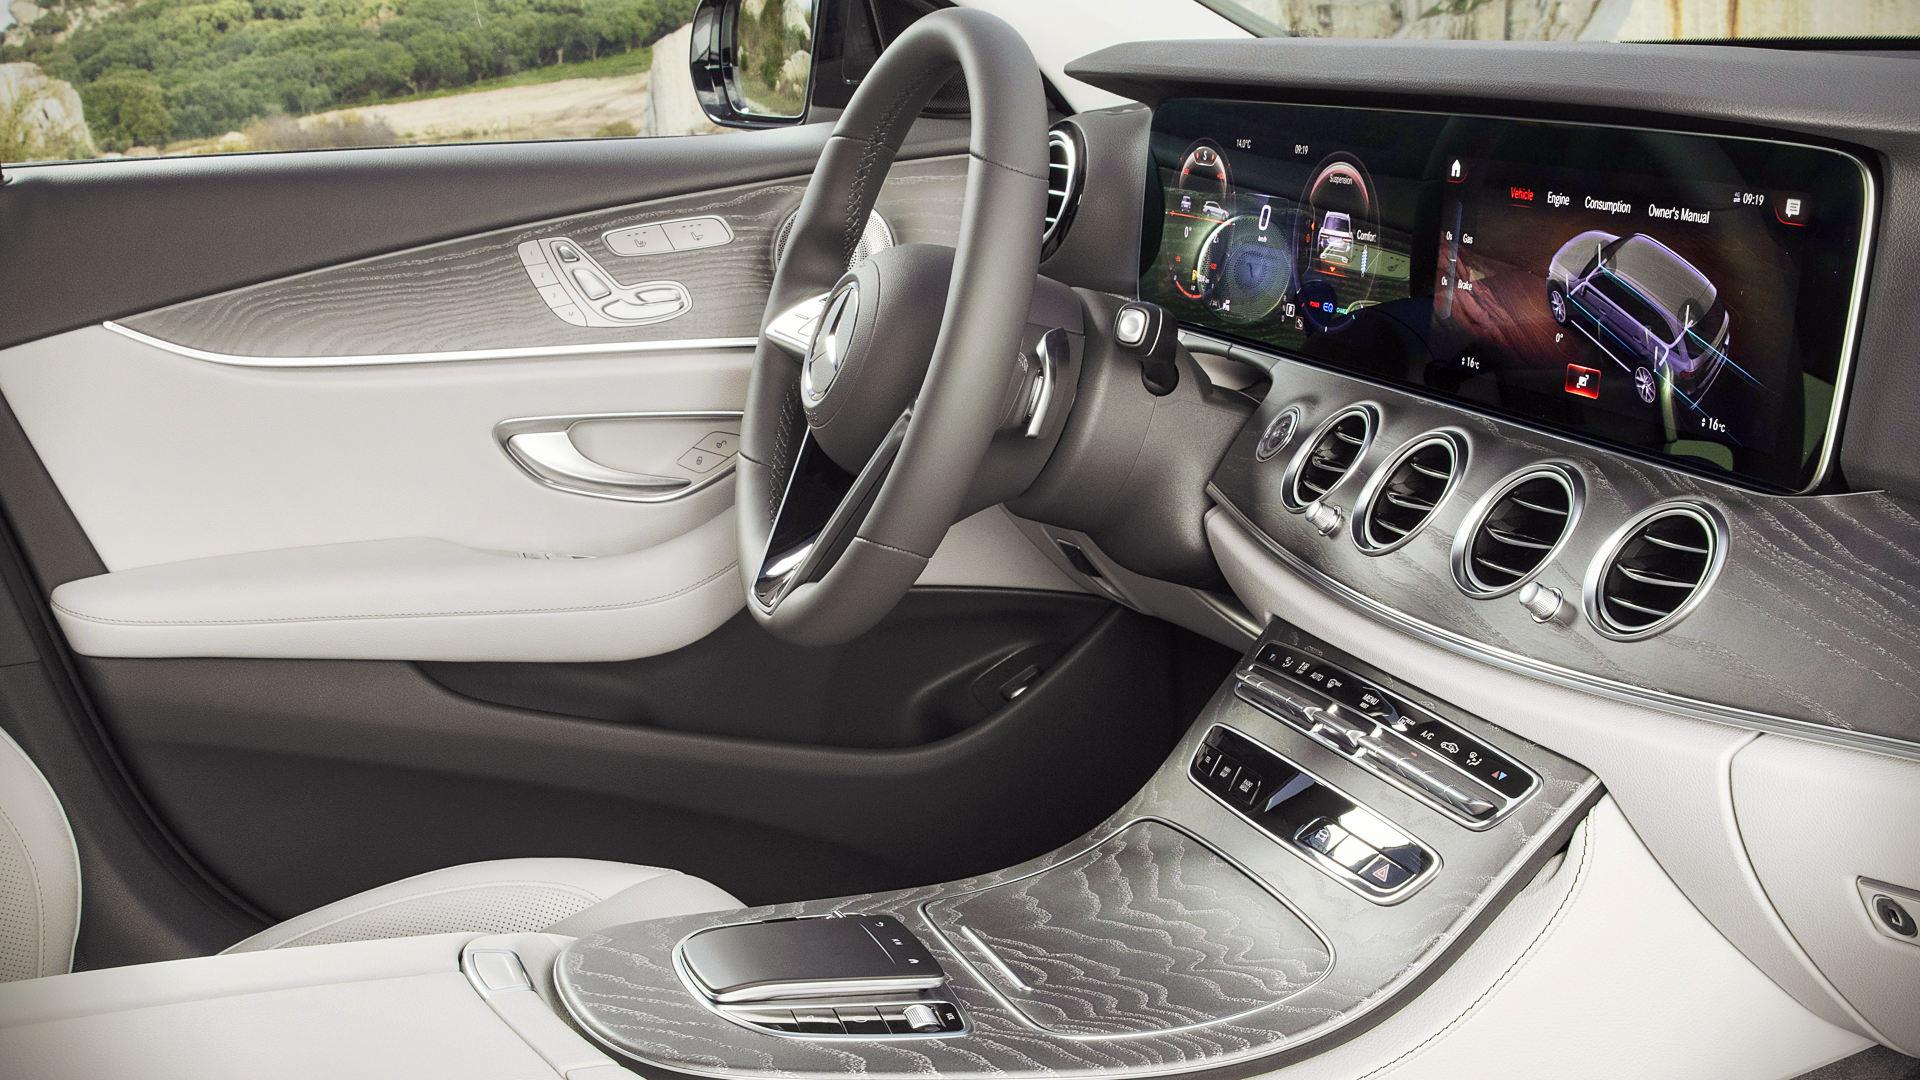 2021 Mercedes Benz E-Class 350 All-Terrain Interior